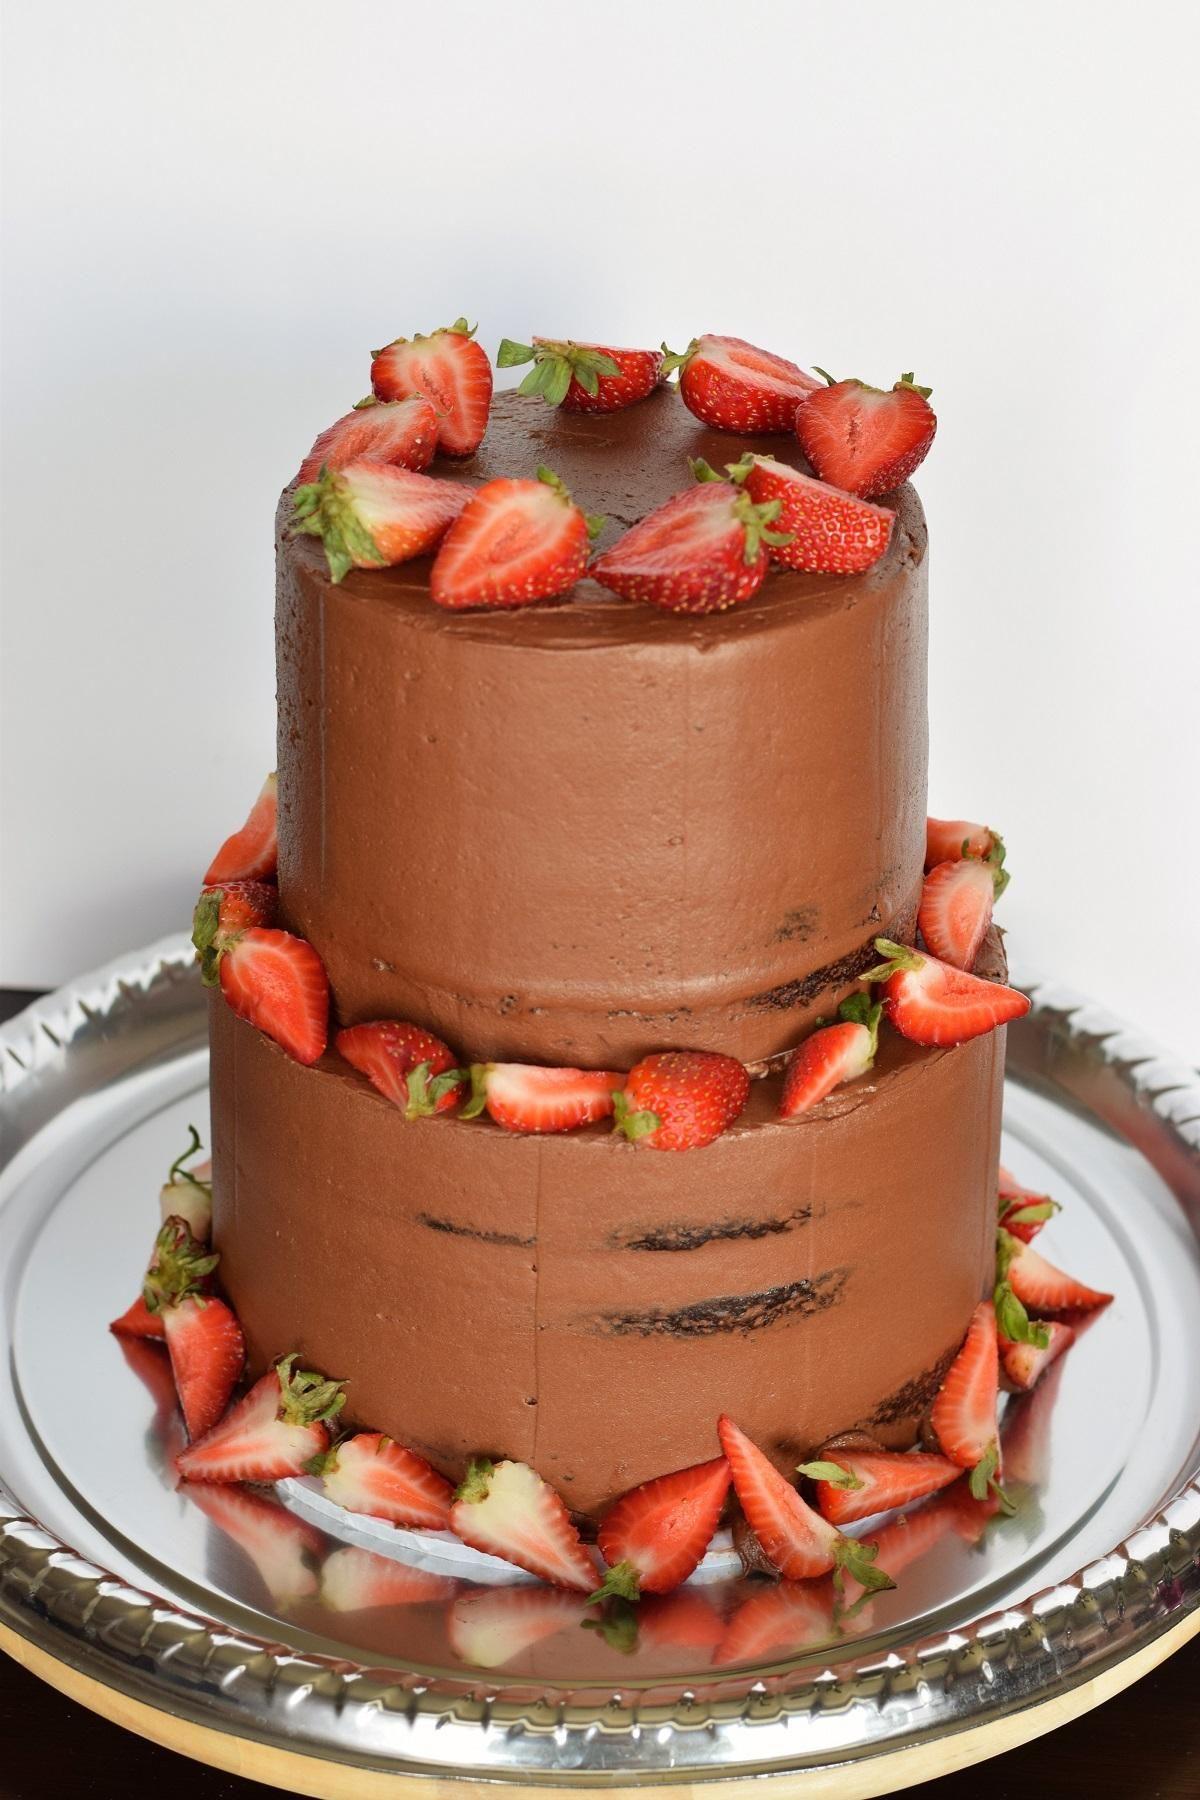 Chocolate Wedding Cake With Strawberry Filling Bunny Baubles 1200 1800 Strawberry Cake Filling Strawberry Cakes Cake